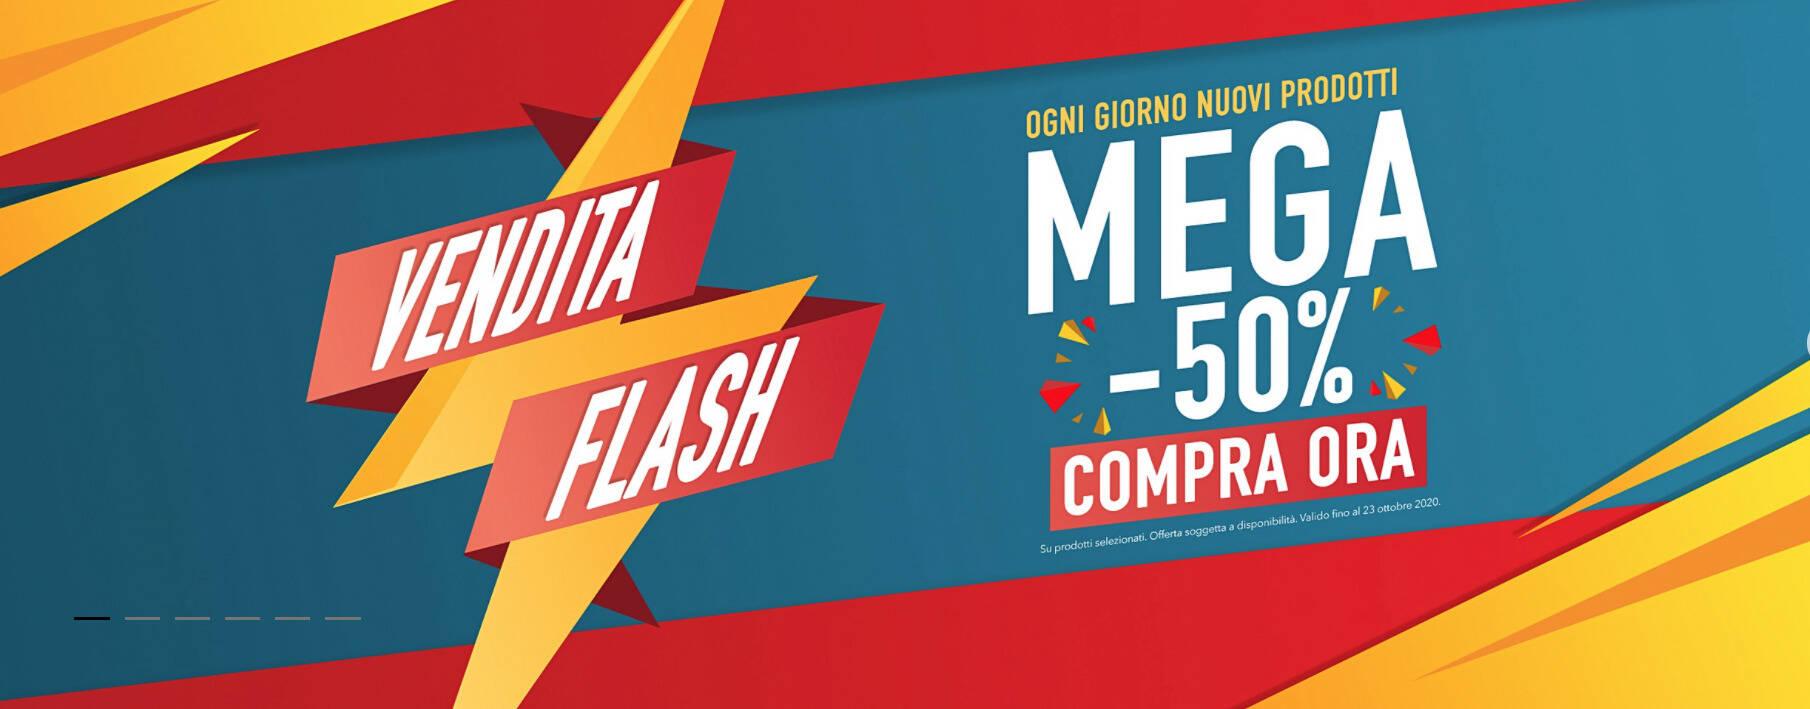 banner eaglemoss vendita flash